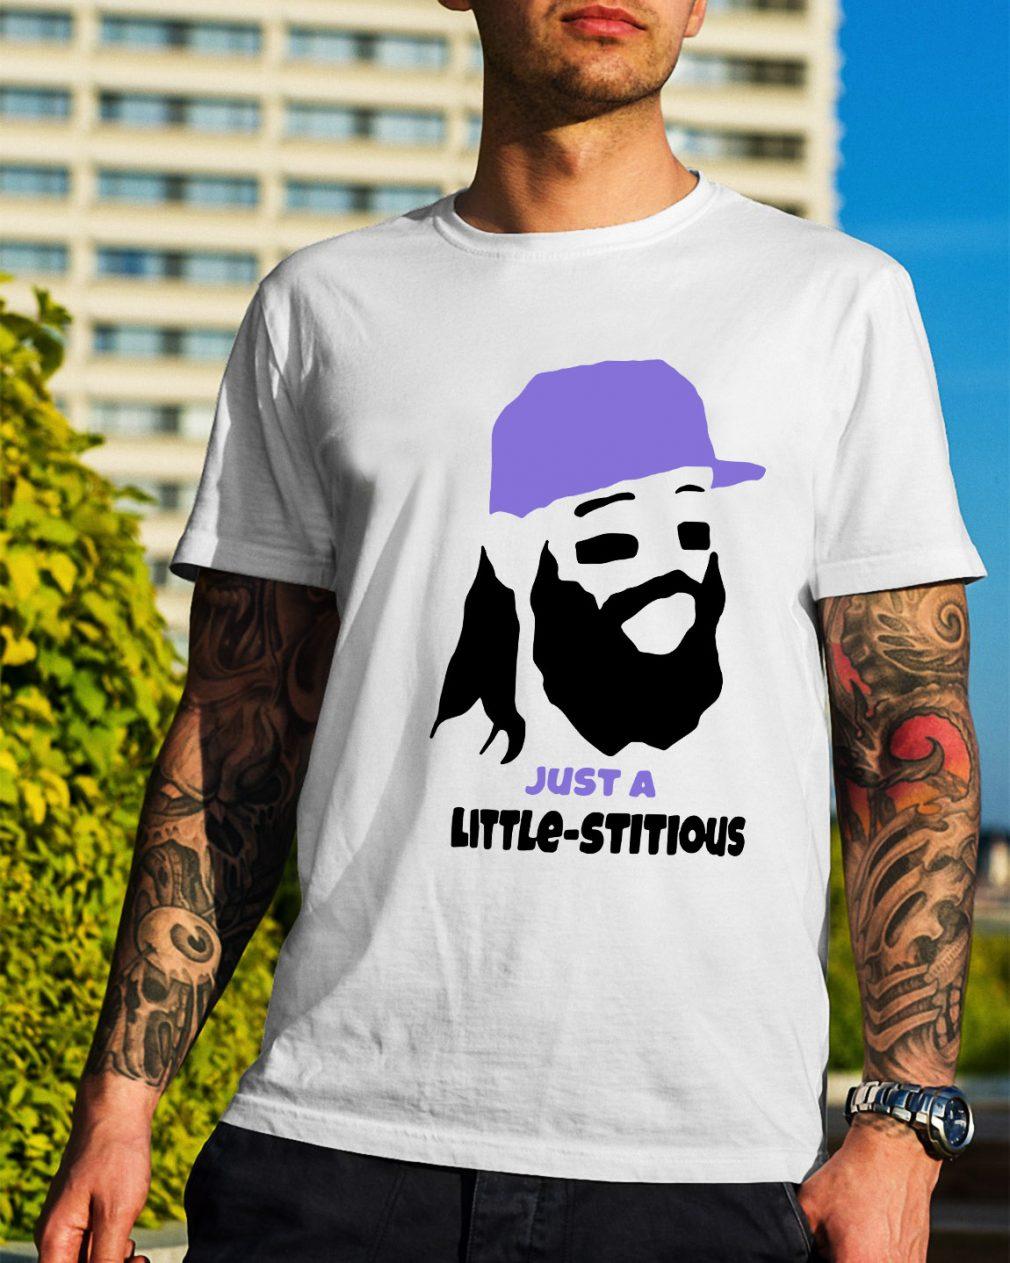 Charlie Blackmon just a little-stitious shirt